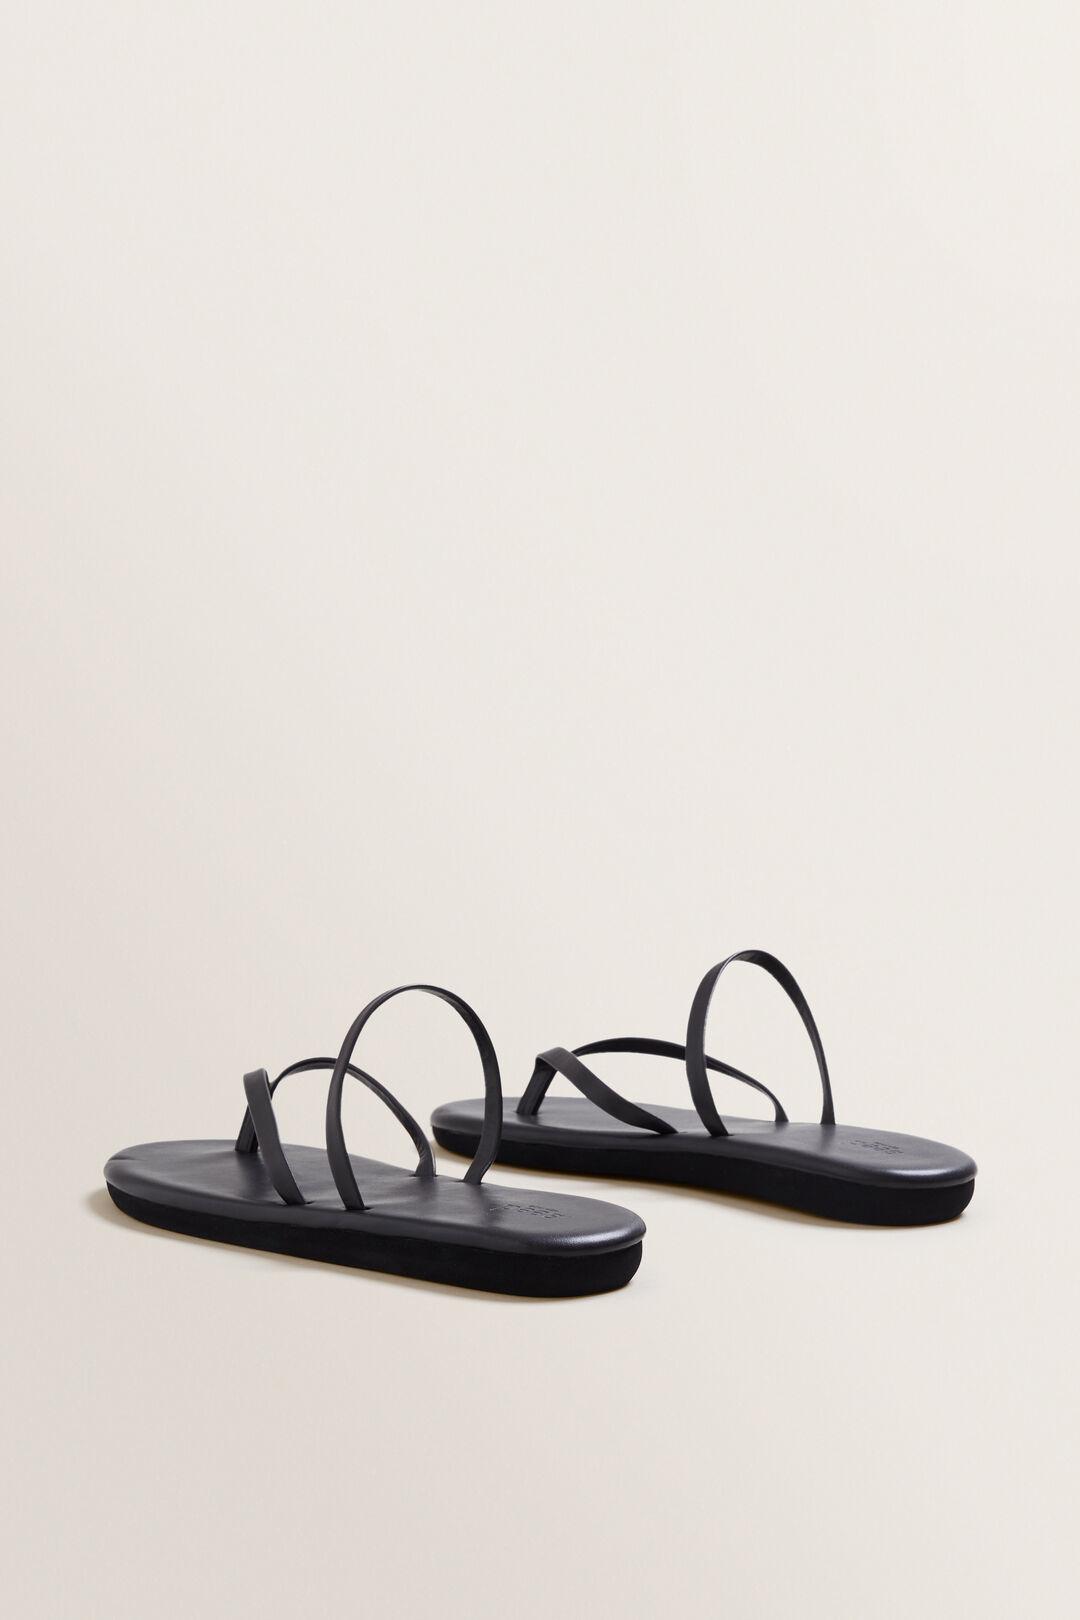 Sam Leather Thong  BLACK  hi-res